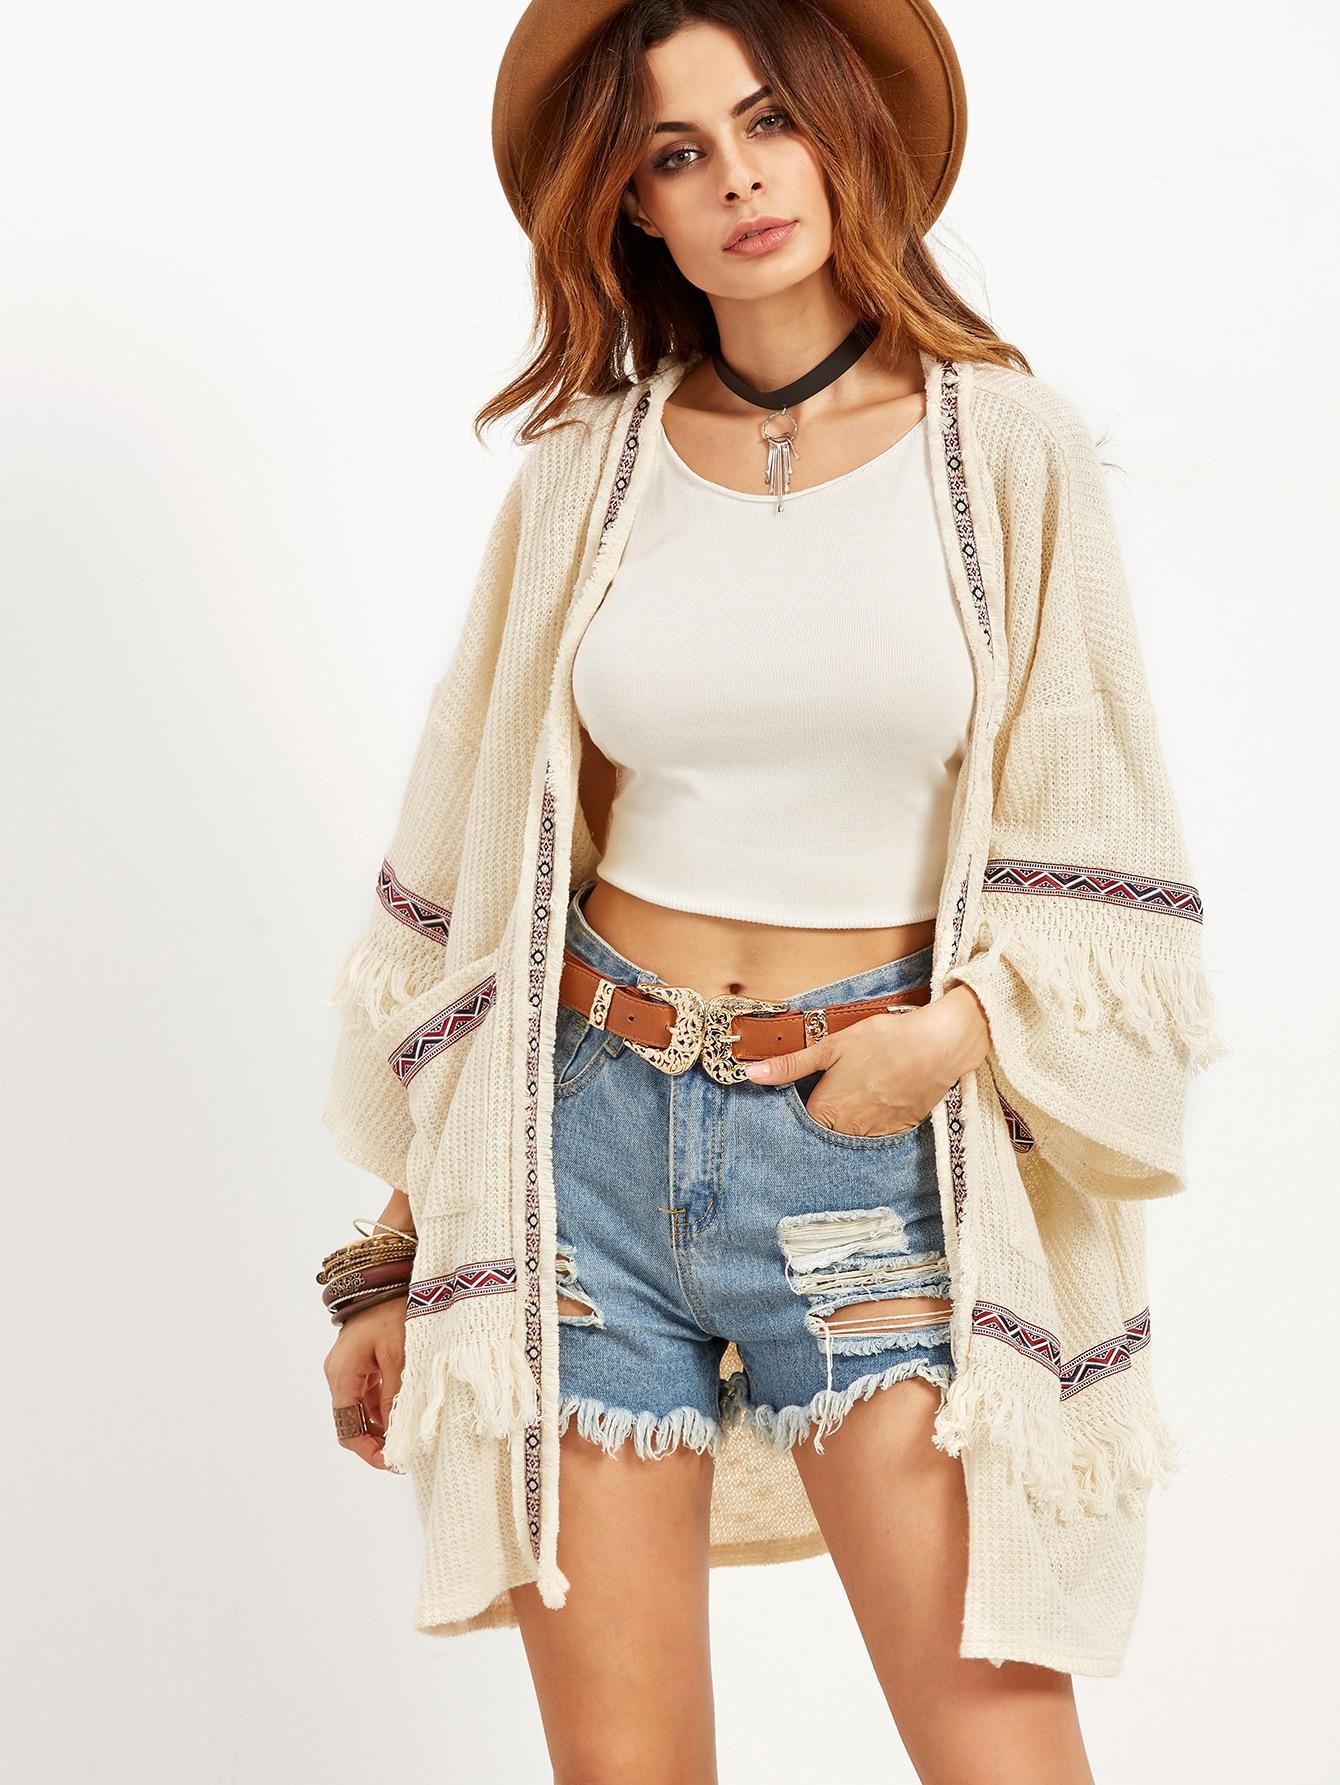 sweater160825501_2